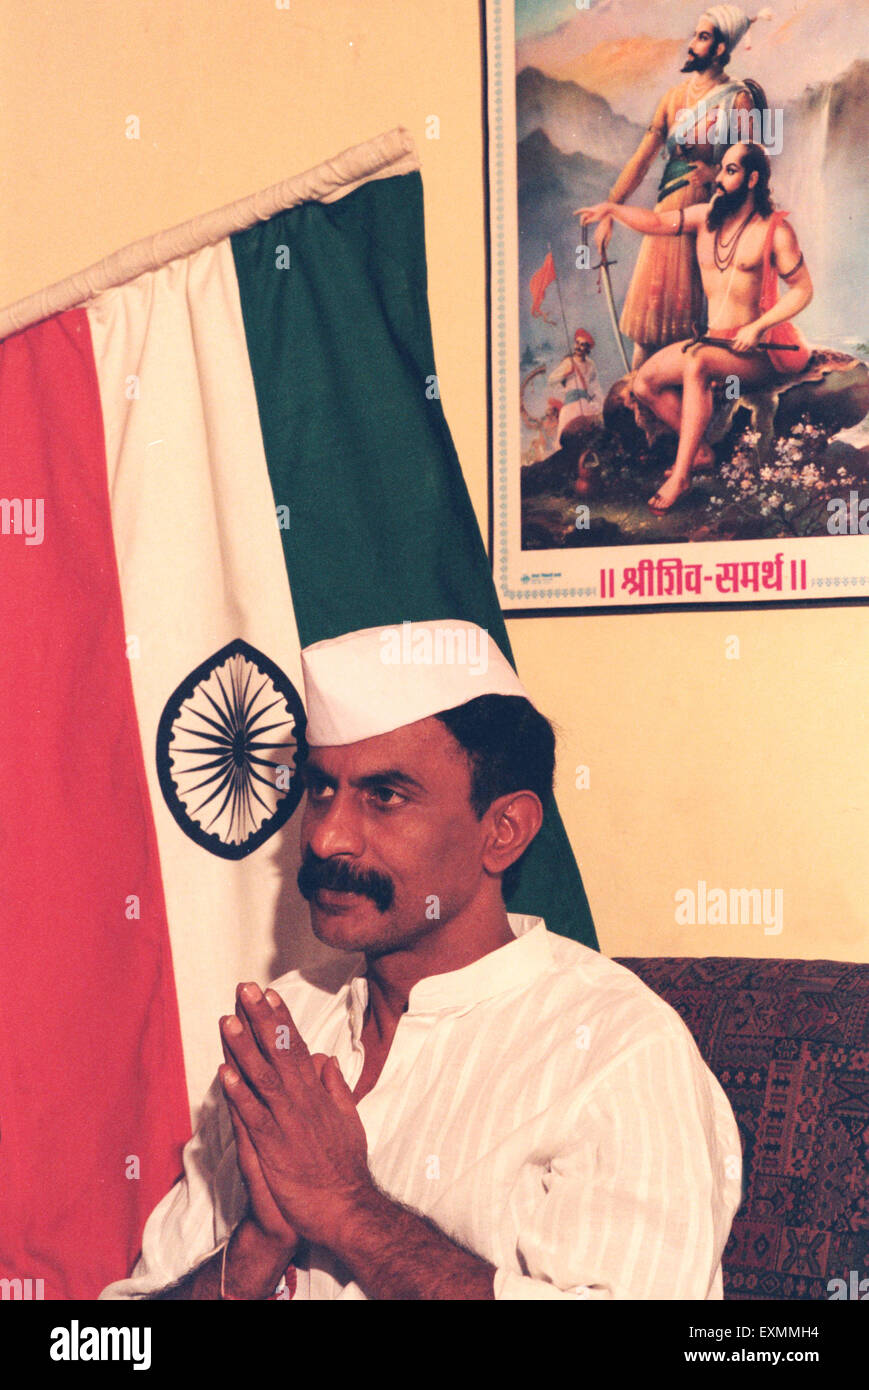 Arun Gawli Daddy notorious gangster turned politician Akhil Bhartiya Sena - Stock Image